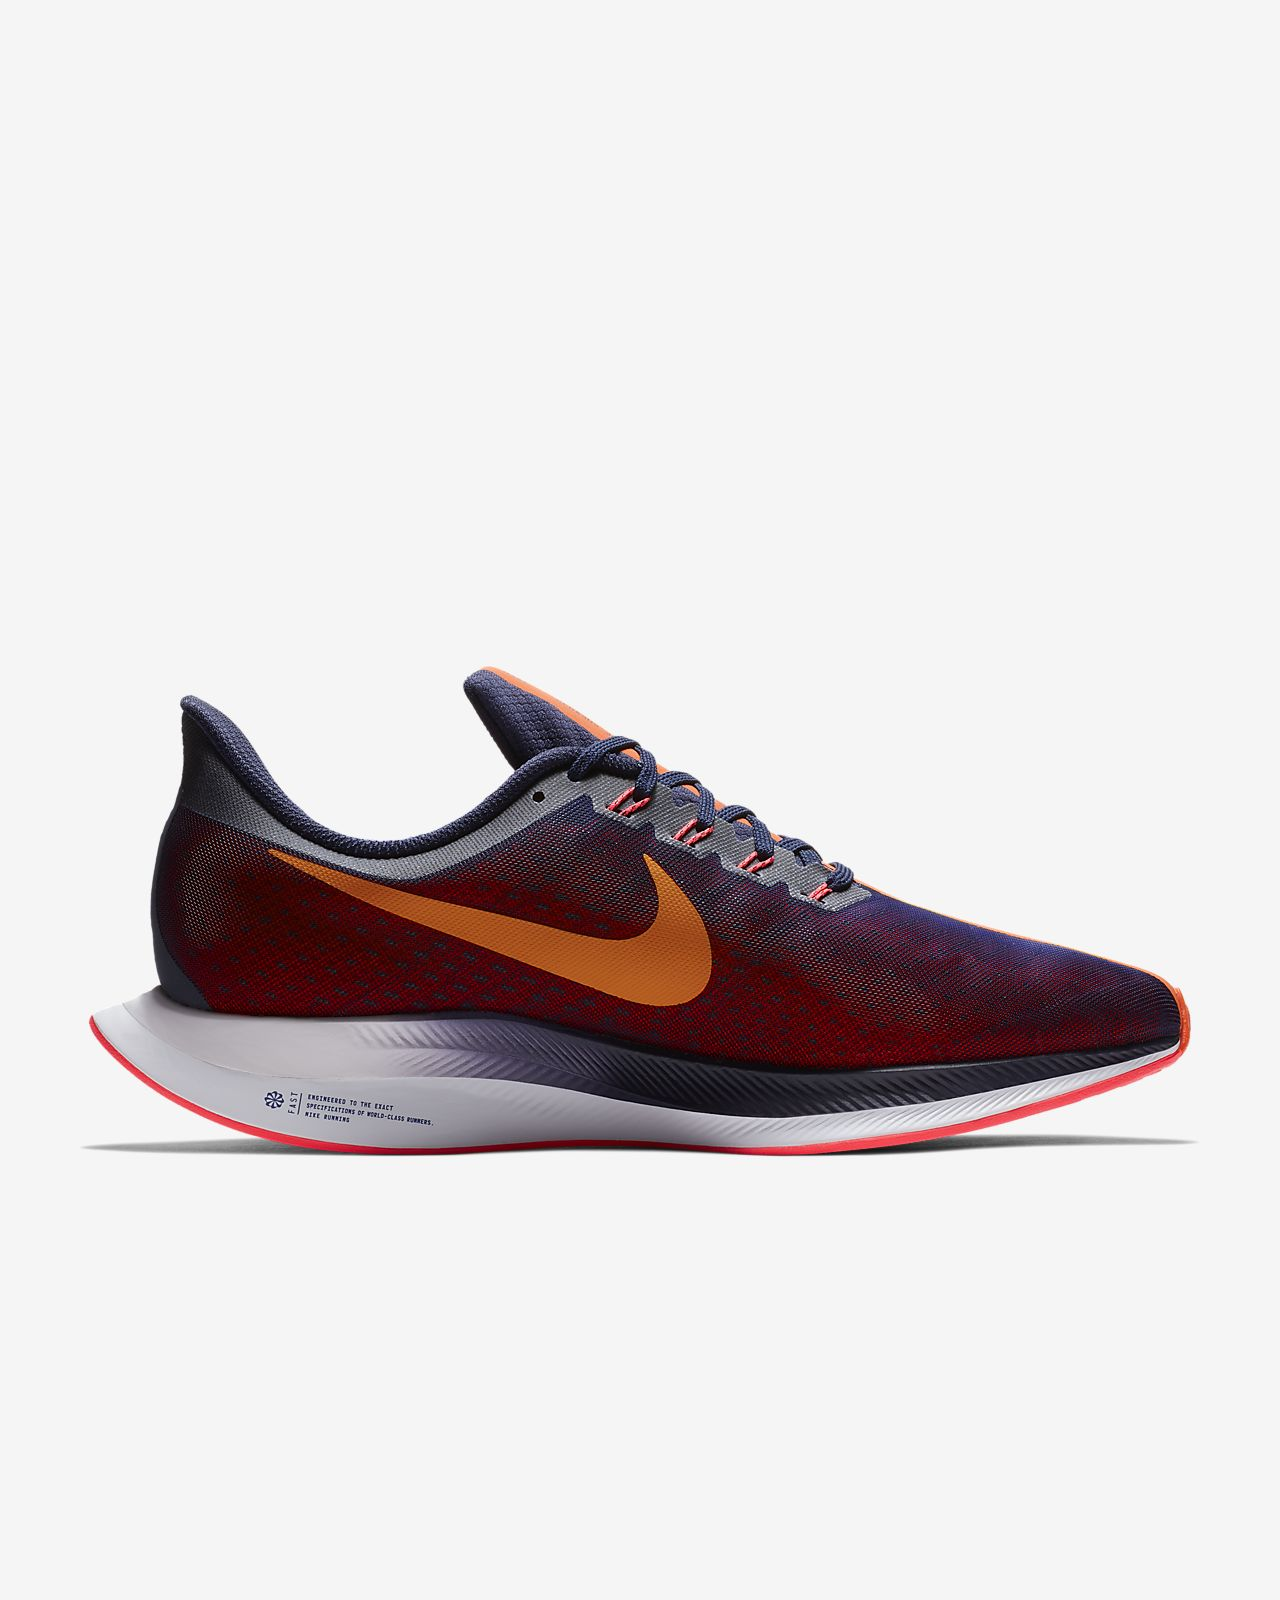 e3cf4da248 Nike Zoom Pegasus Turbo Men's Running Shoe. Nike.com